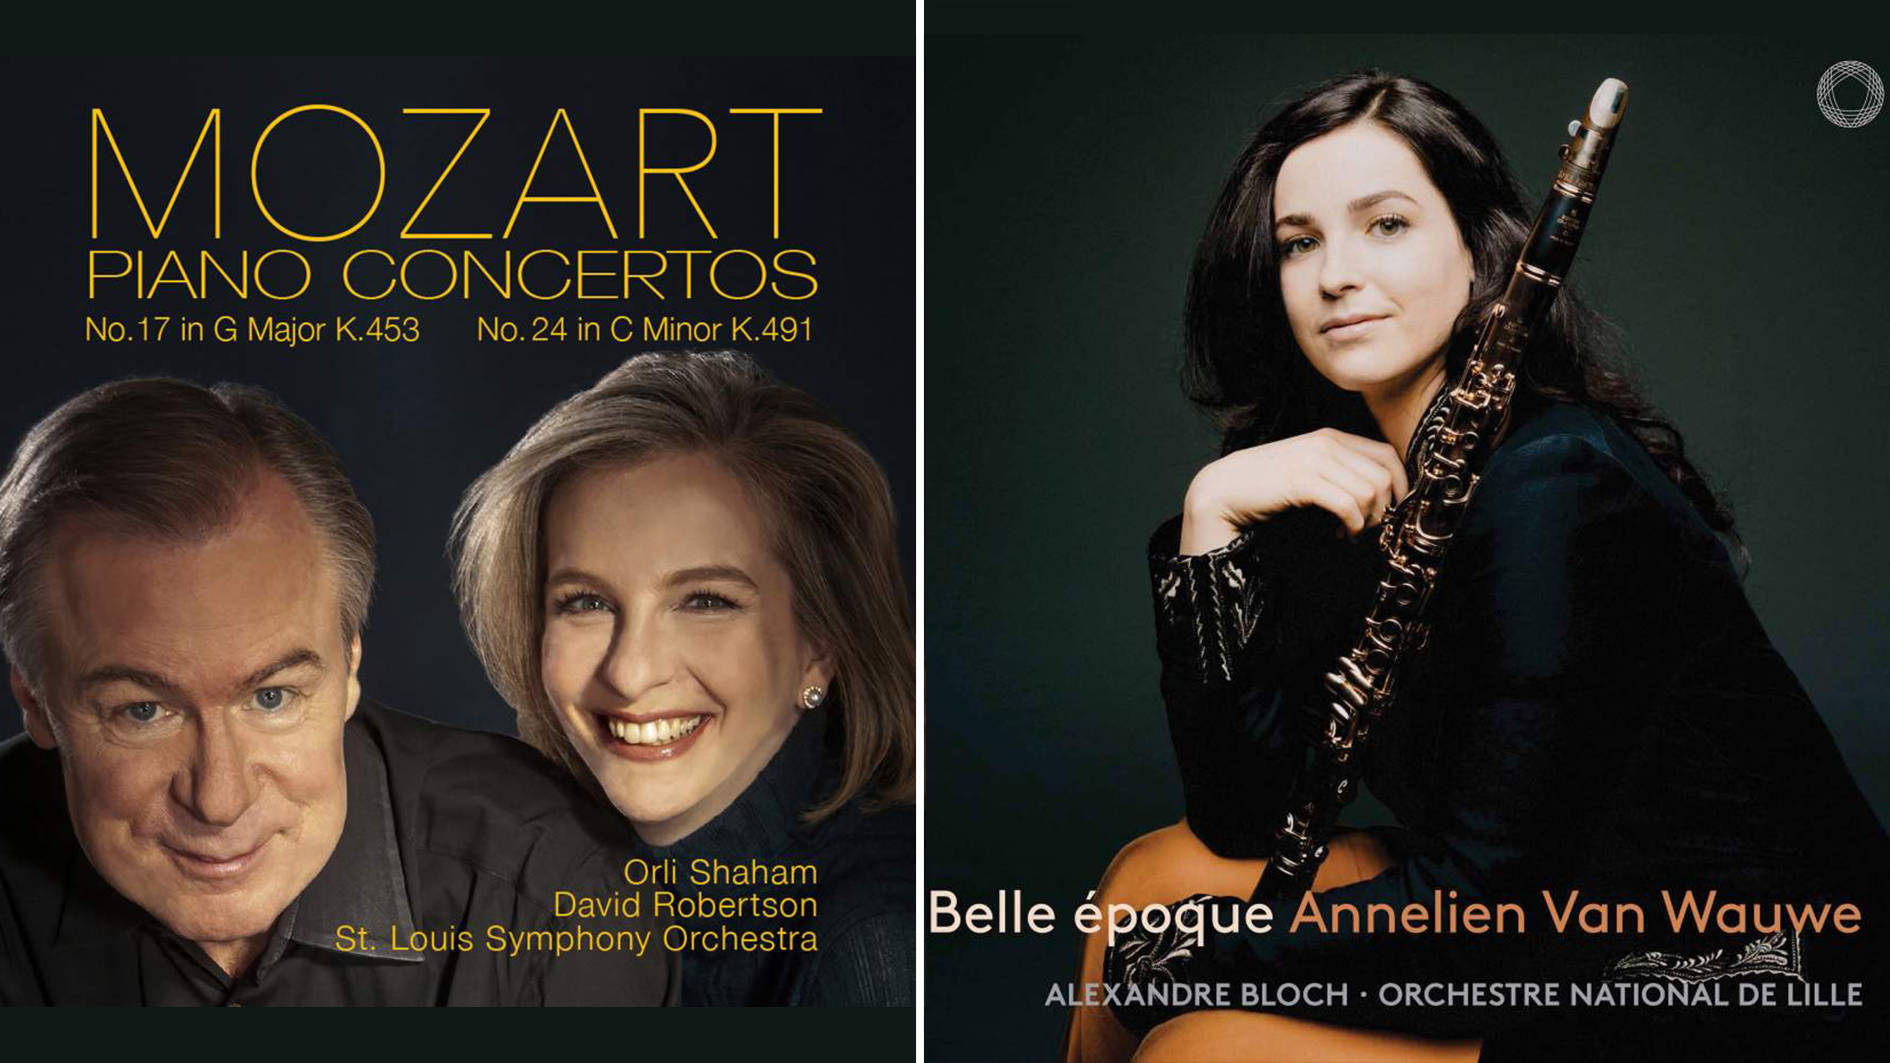 New Releases: Mozart Piano Concertos; Belle Époque